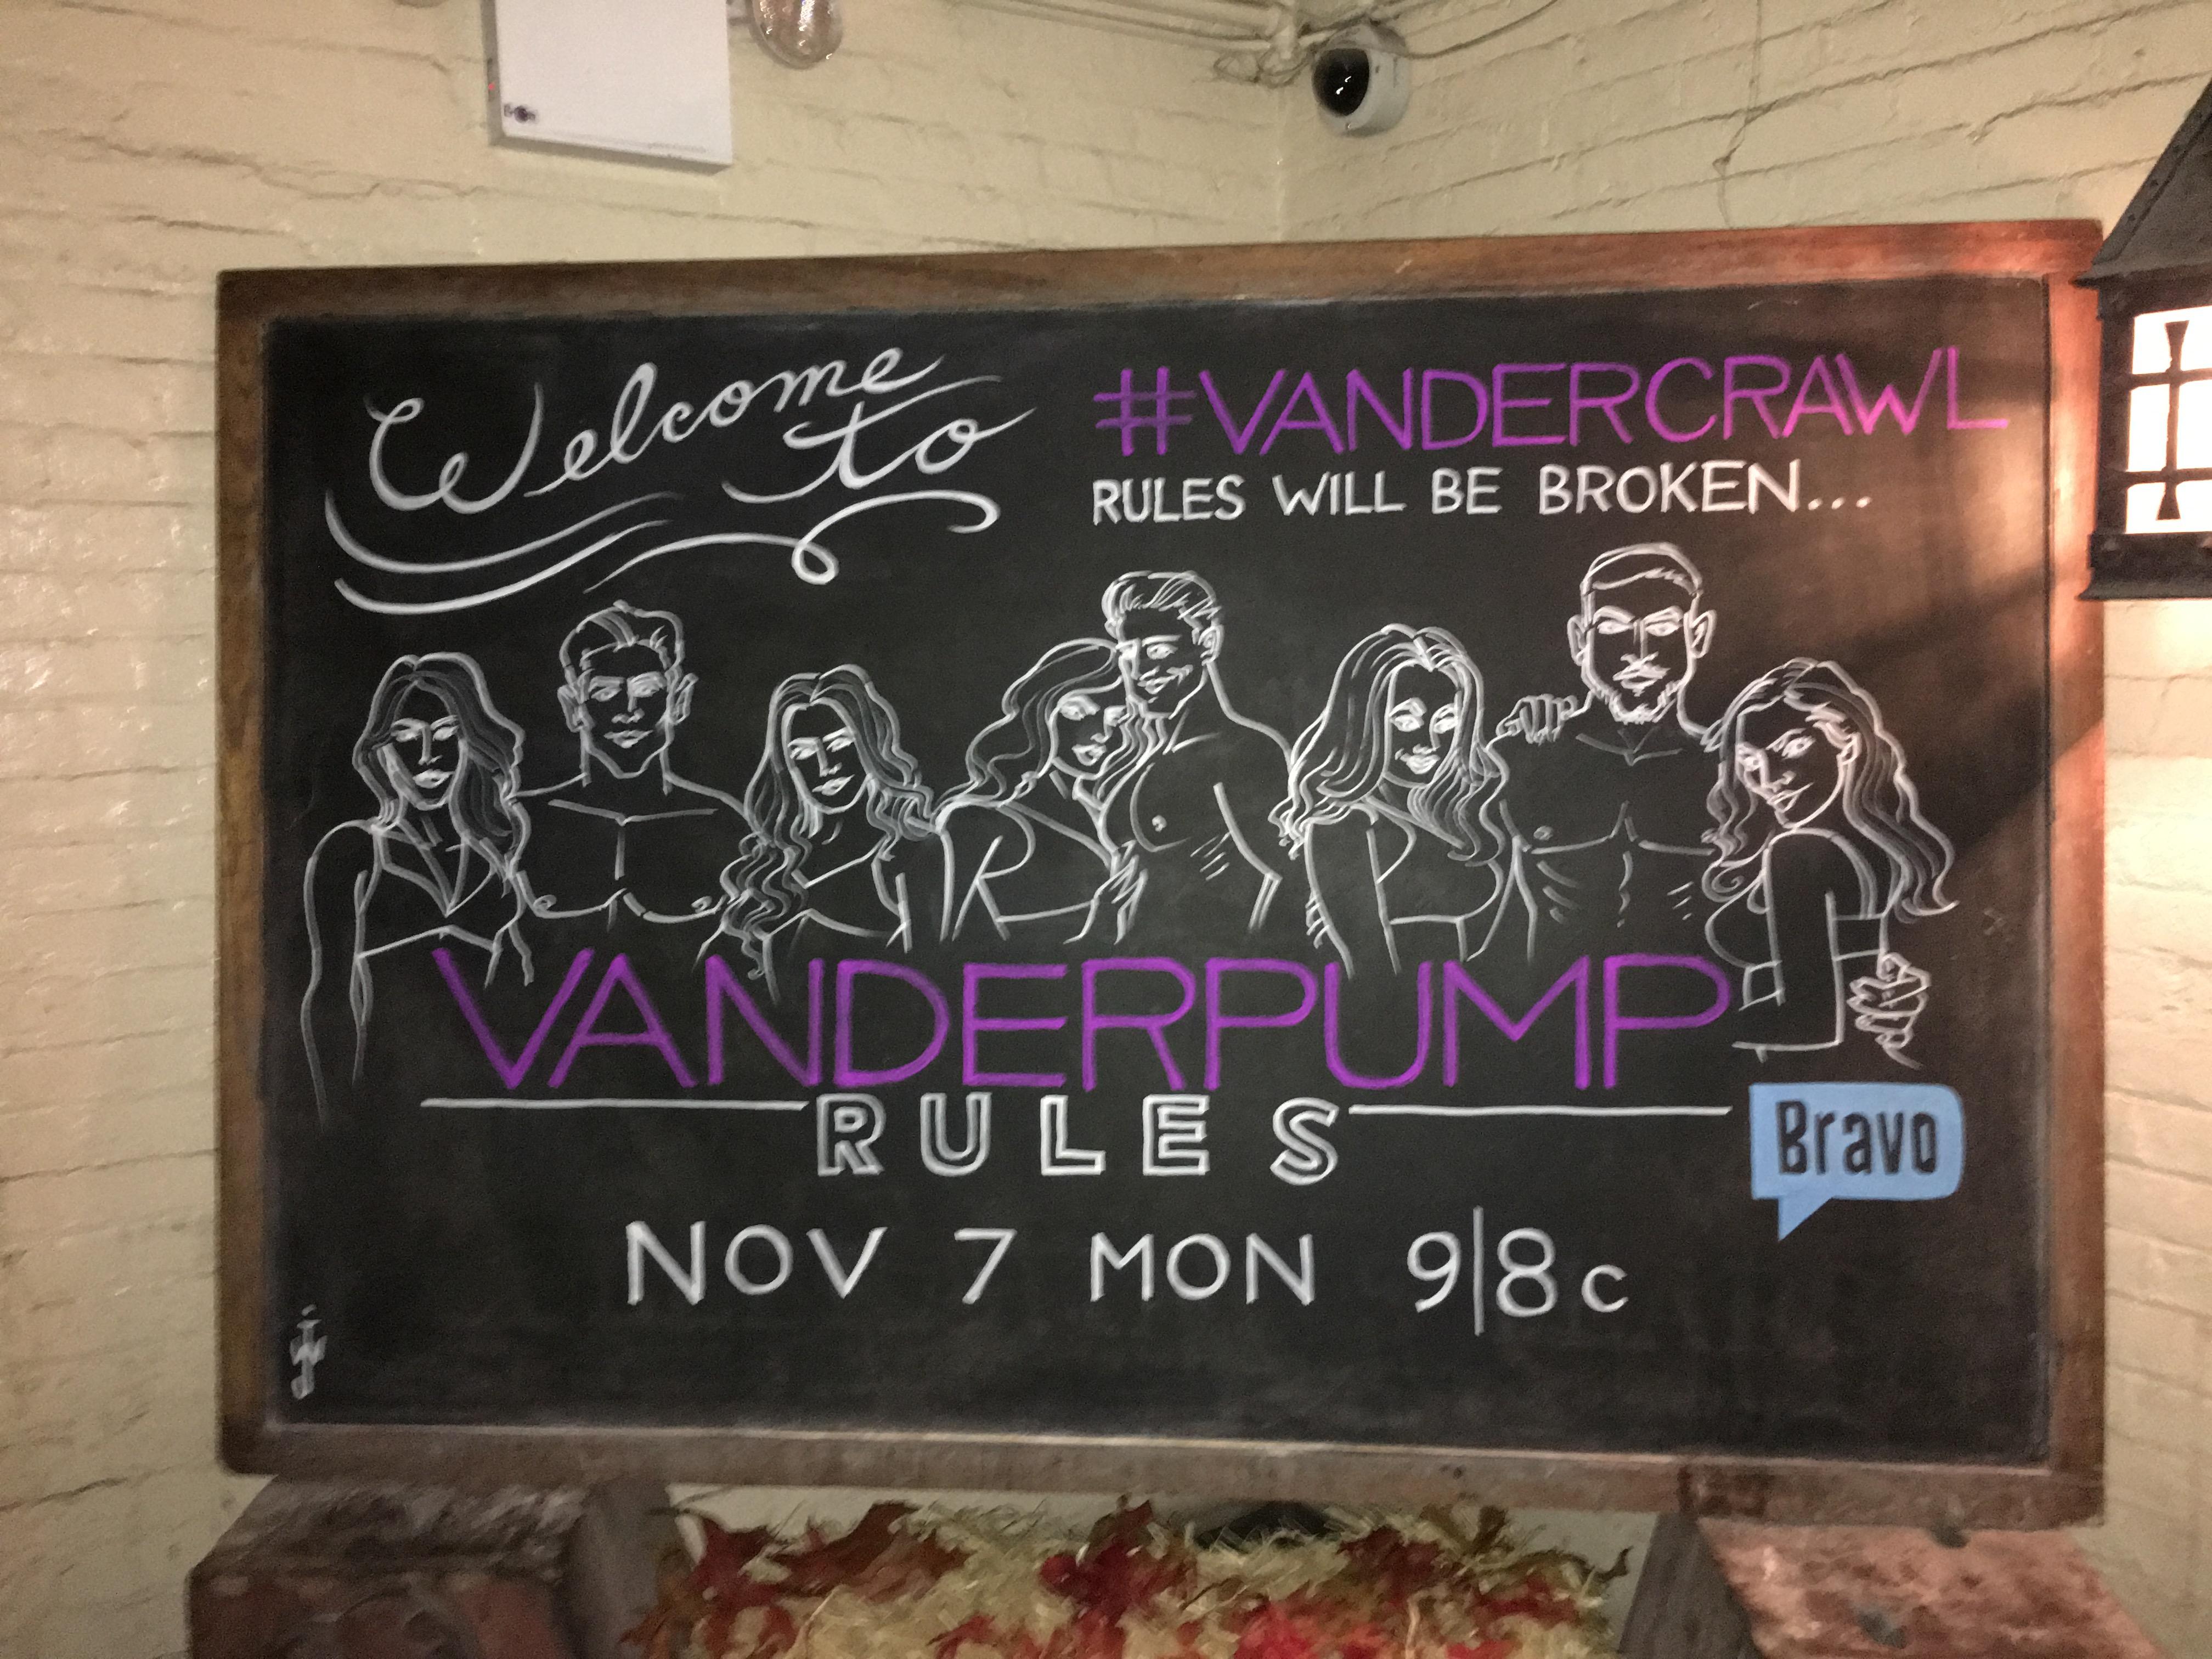 Empire - Bravo's Vanderpump Rules Bar Crawl